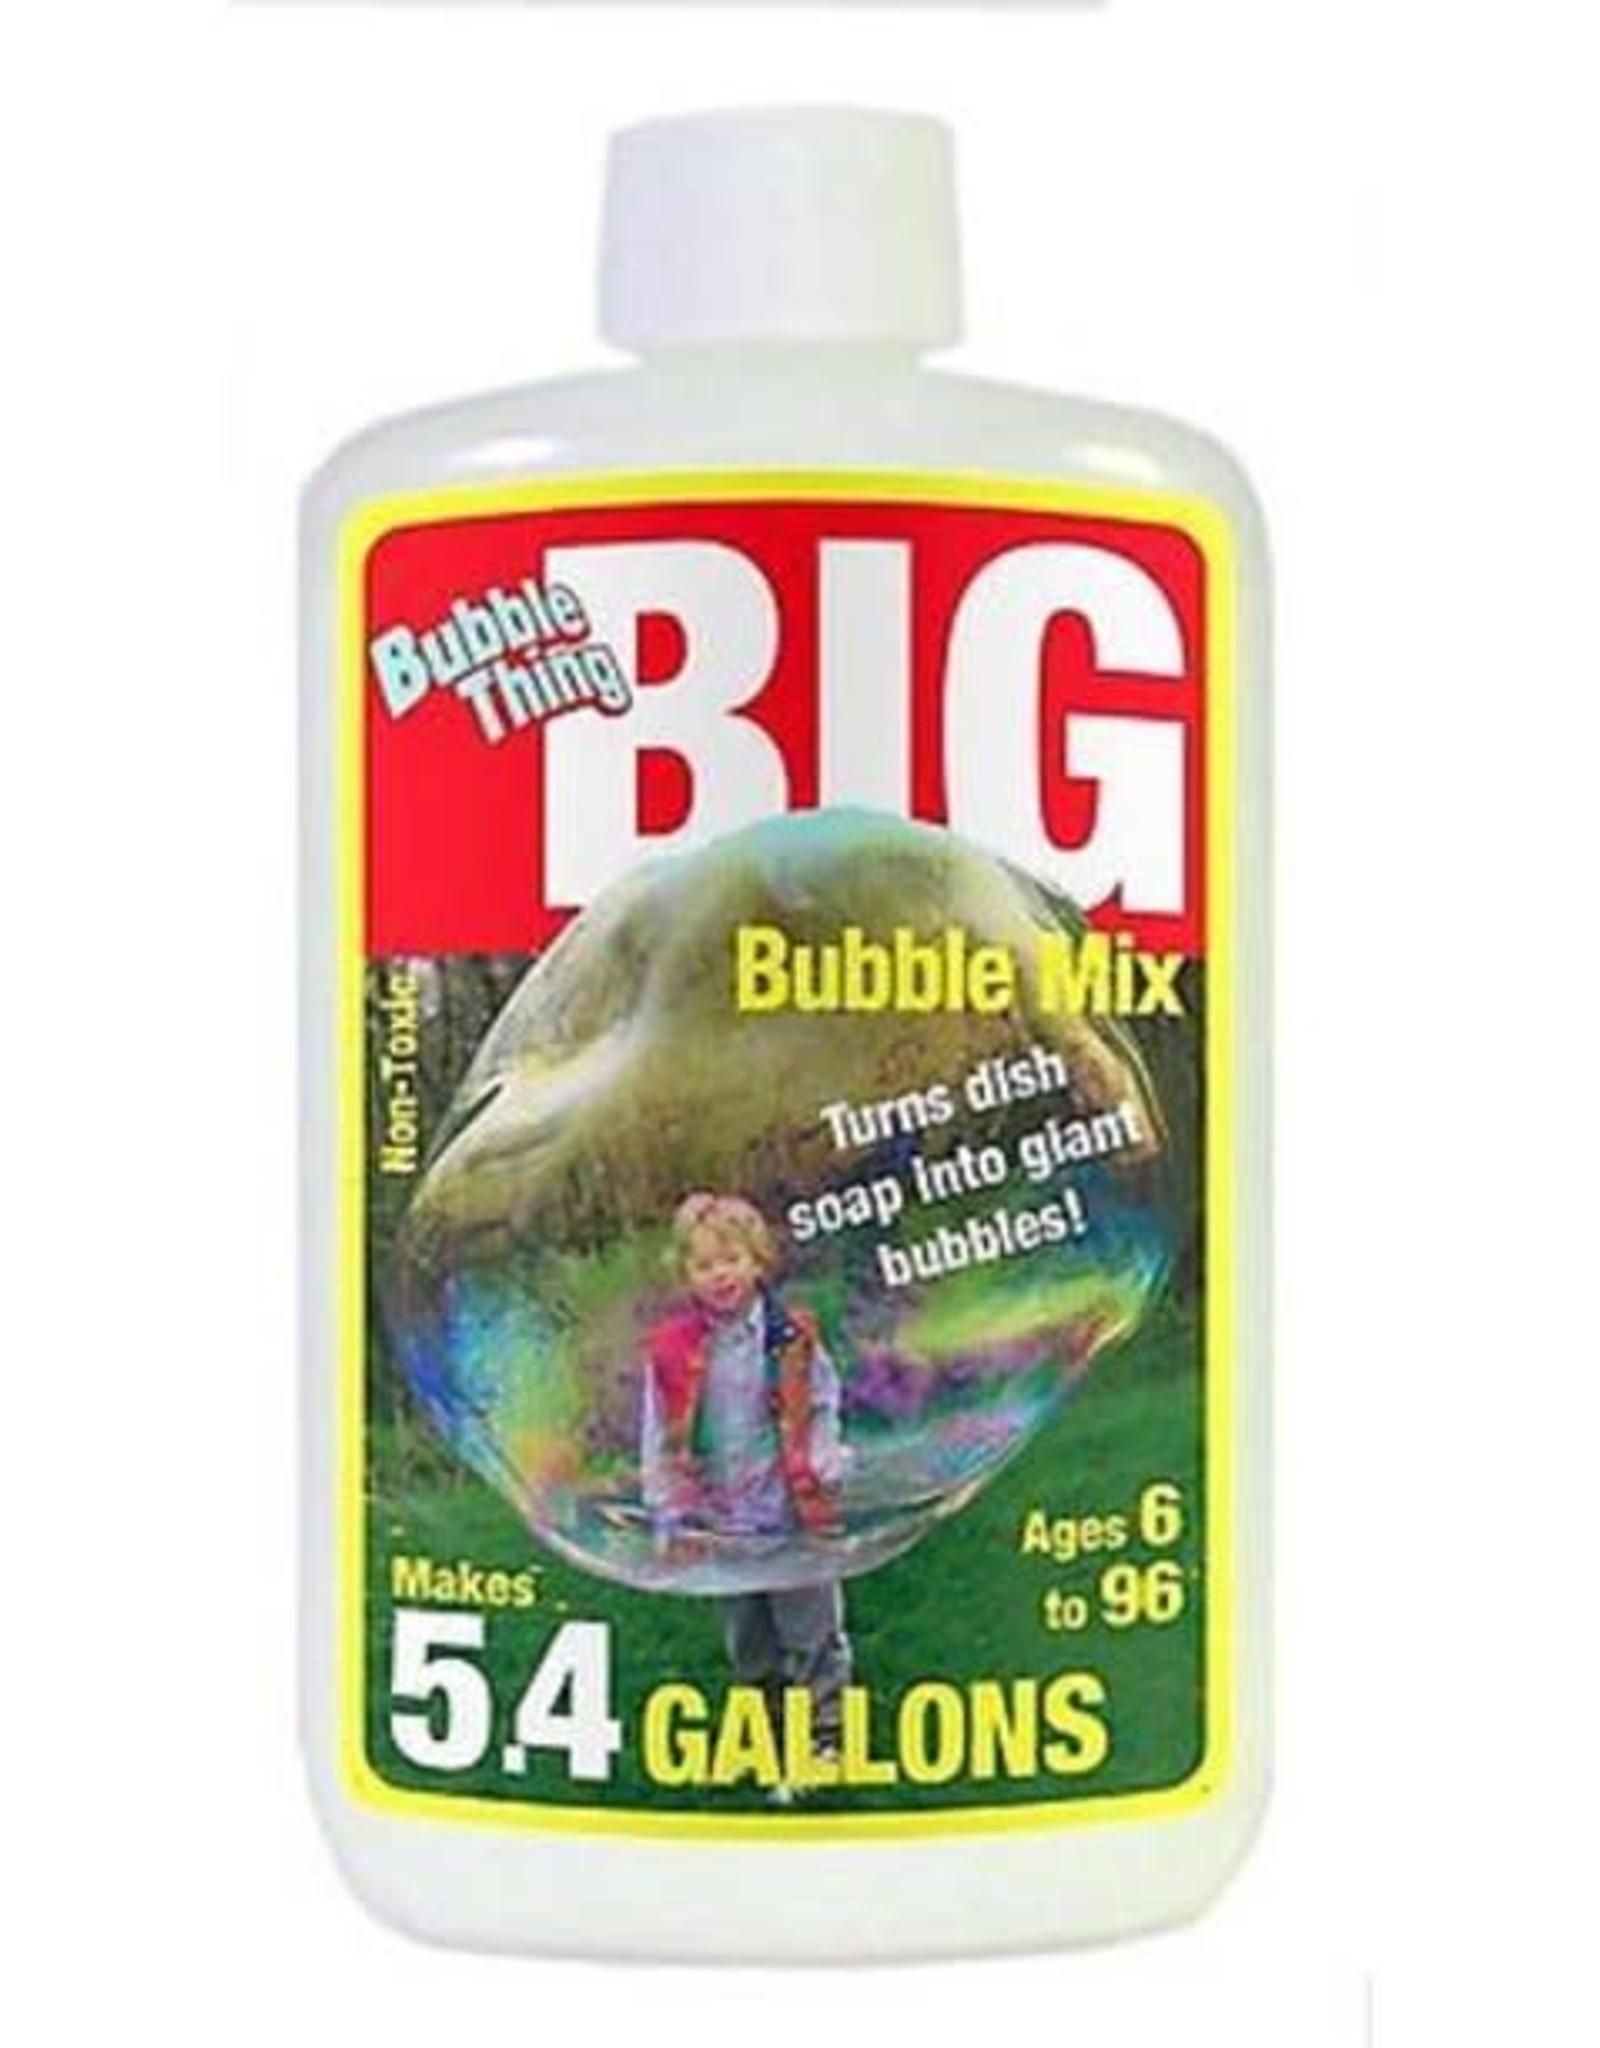 Bubble Thing Big Bubble Mix Refill